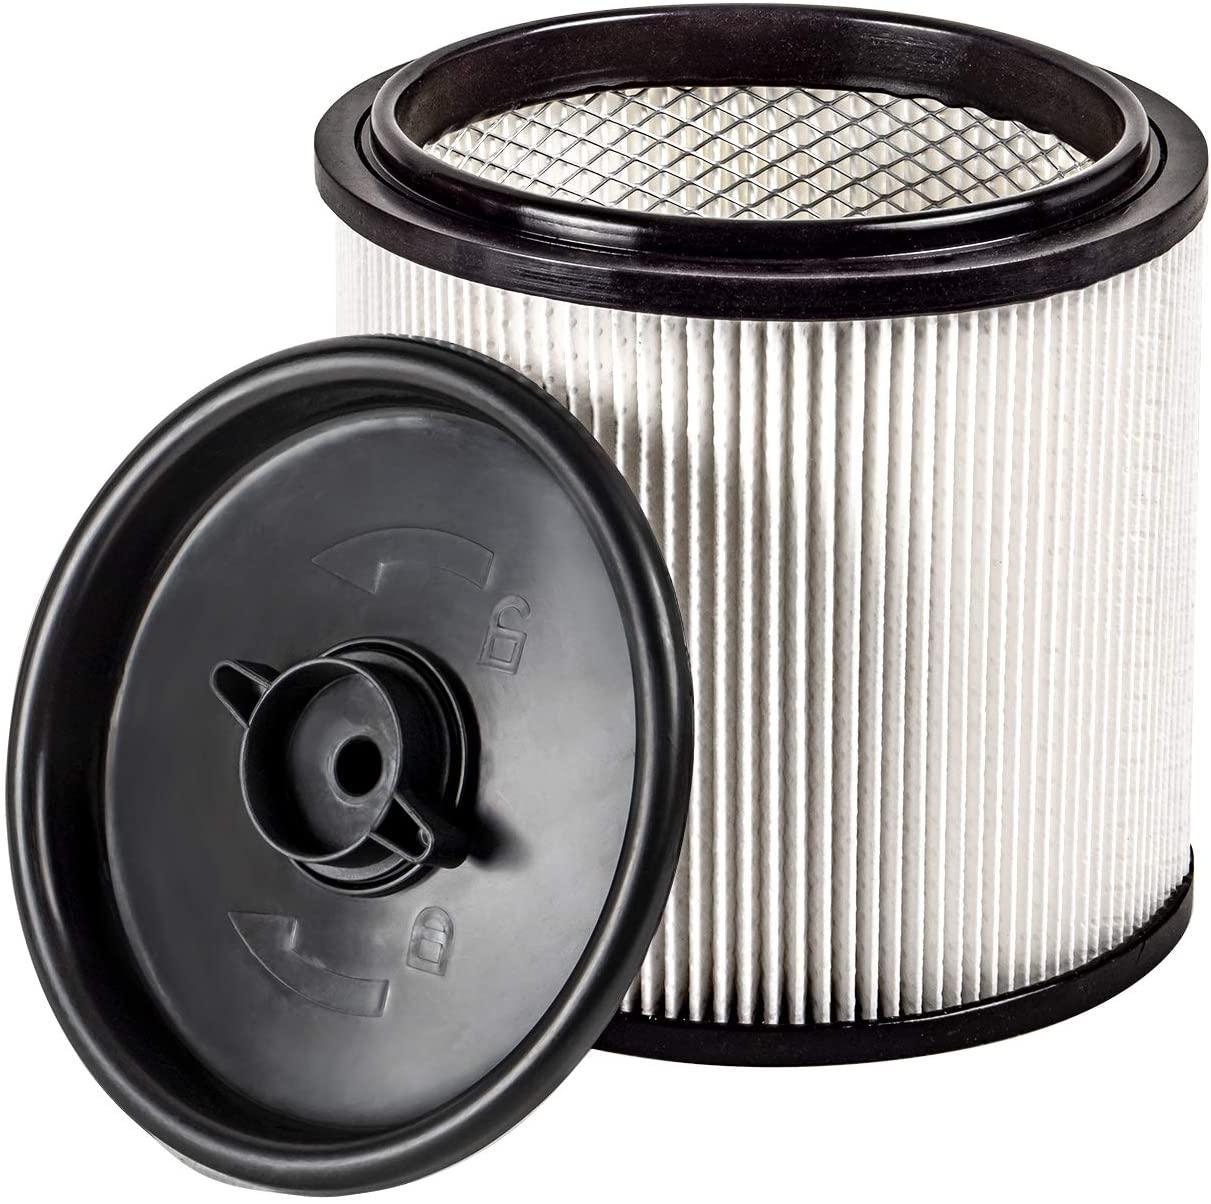 hepa filter image